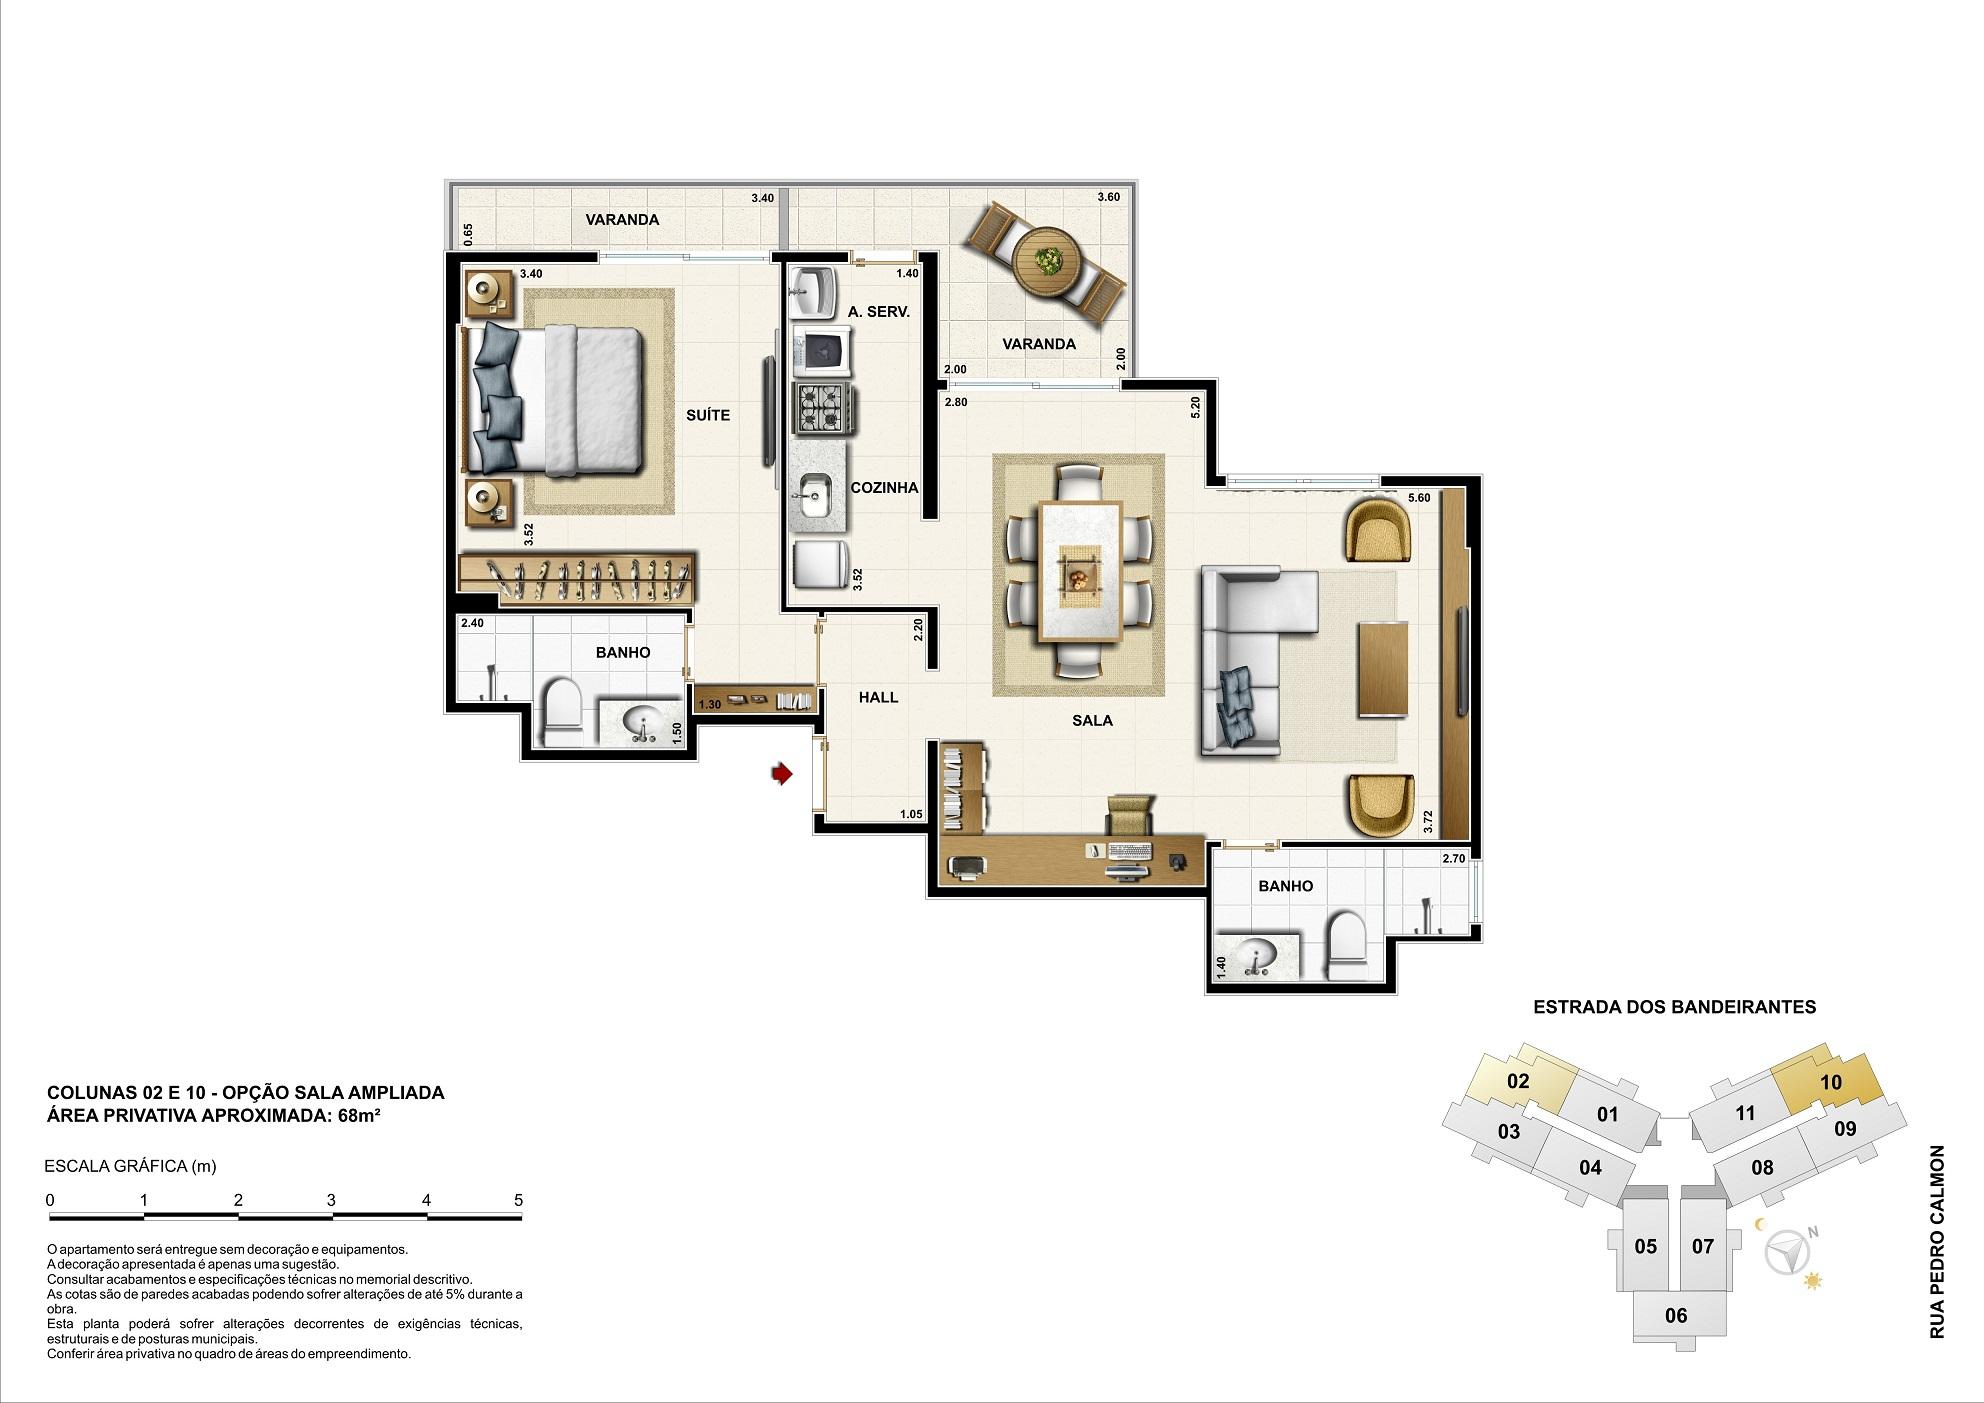 Opção sala ampliada - 68m²